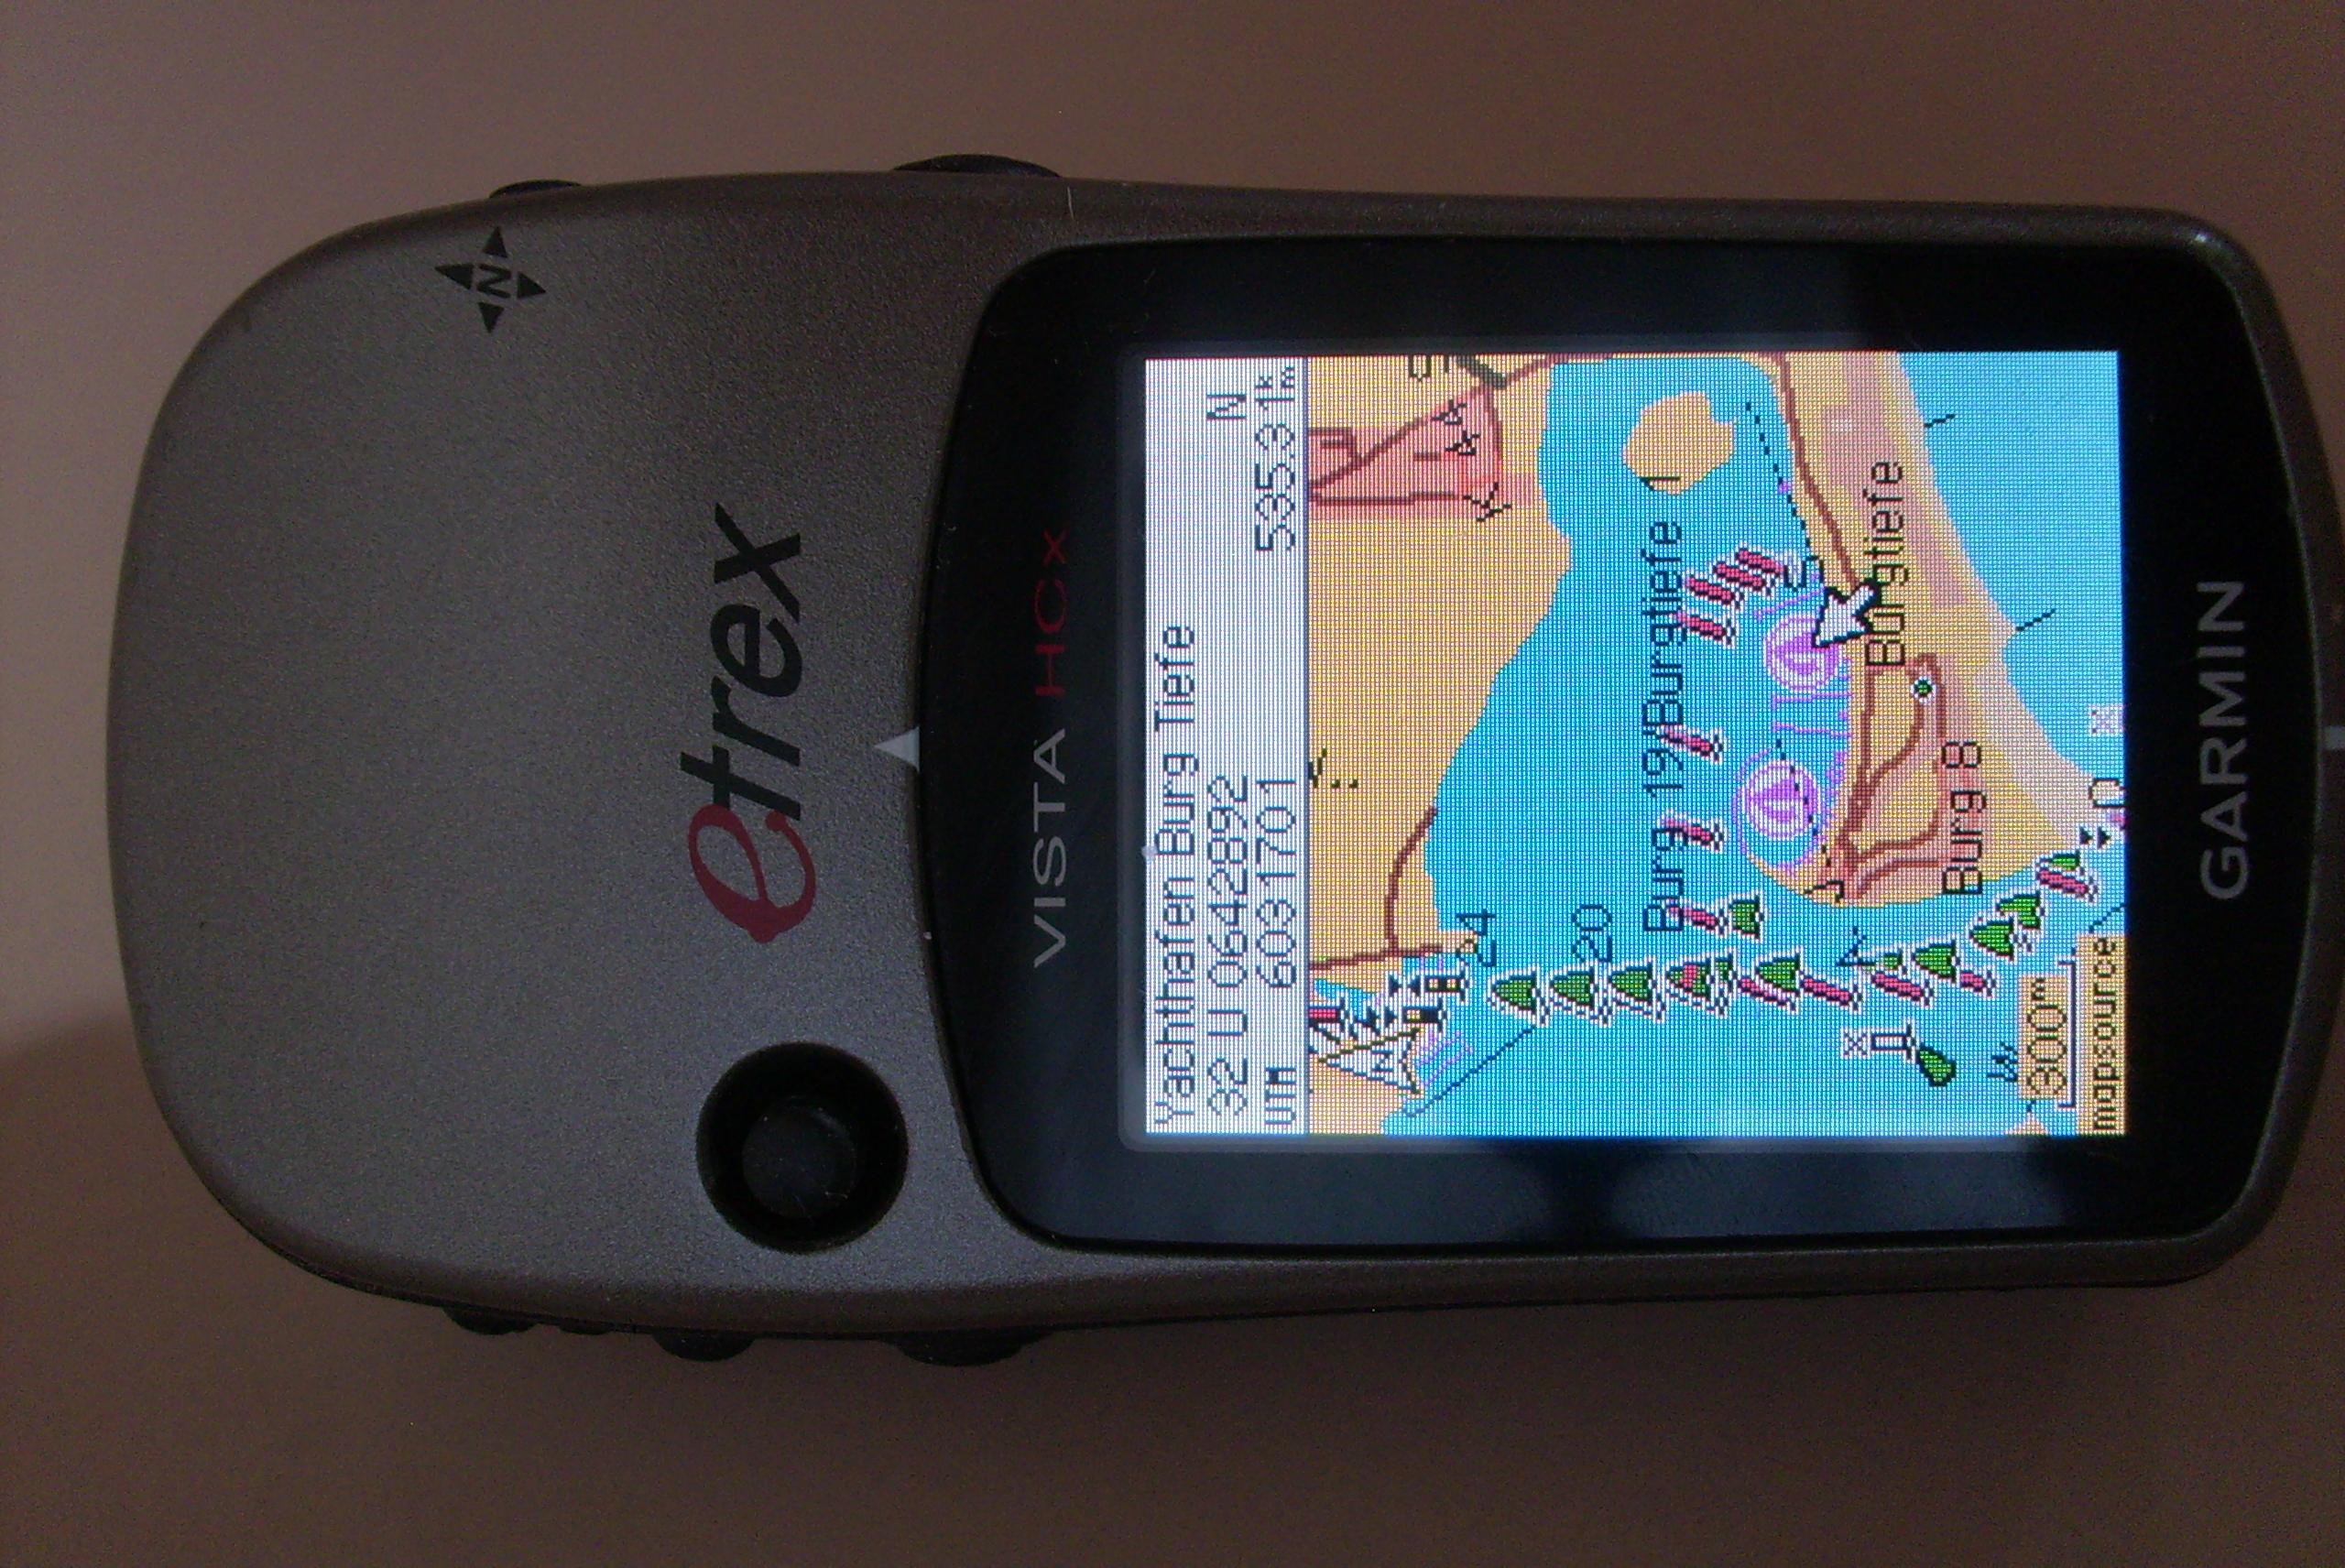 Garmin Etrex Vista Hcx Marine Maps Potomac